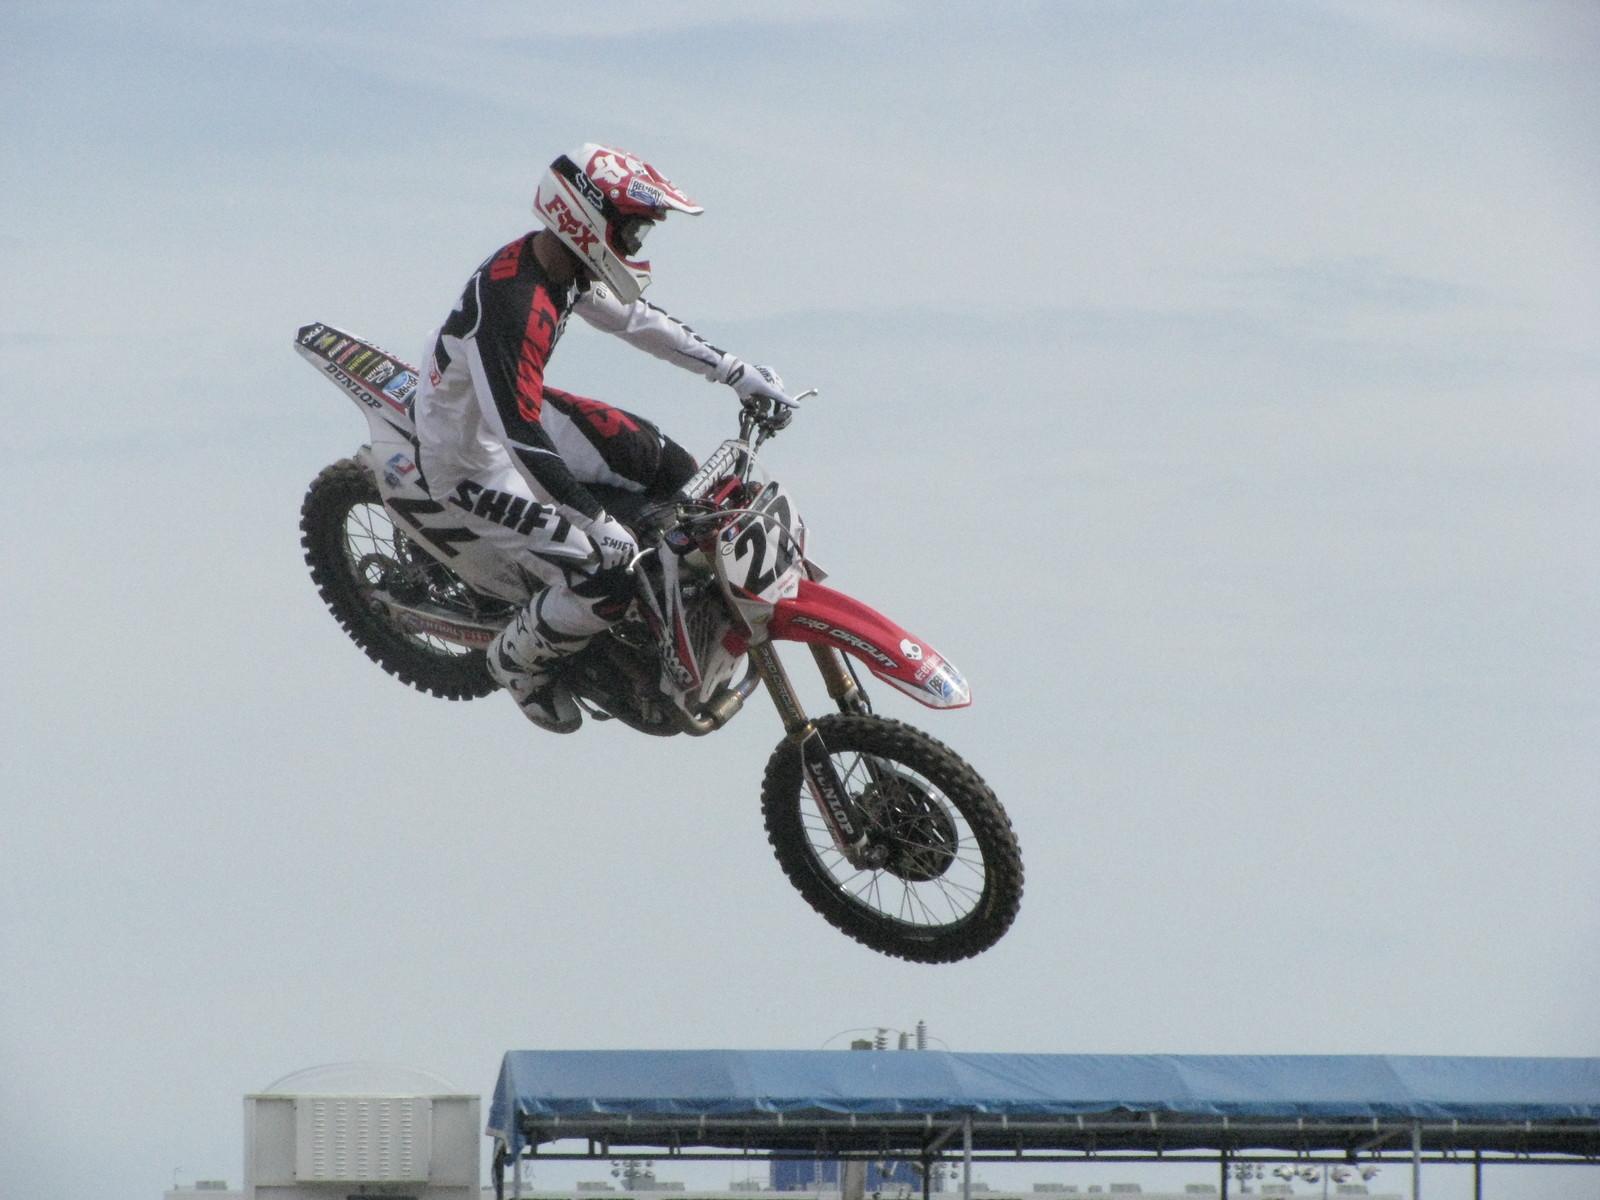 IMG 0527 - MxPro318 - Motocross Pictures - Vital MX